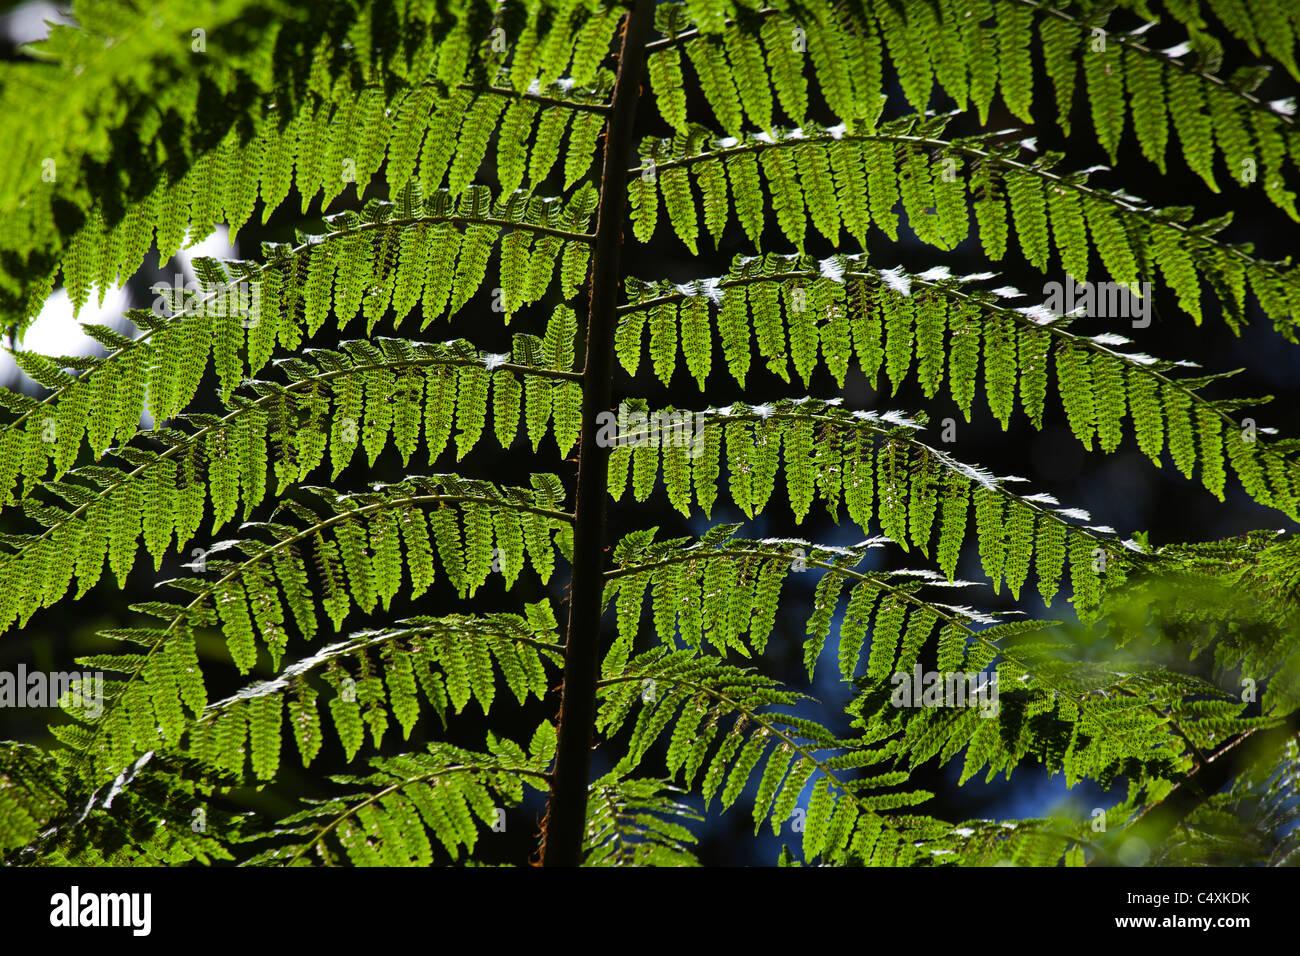 tree fern giant tree fern gymnosperms - Stock Image